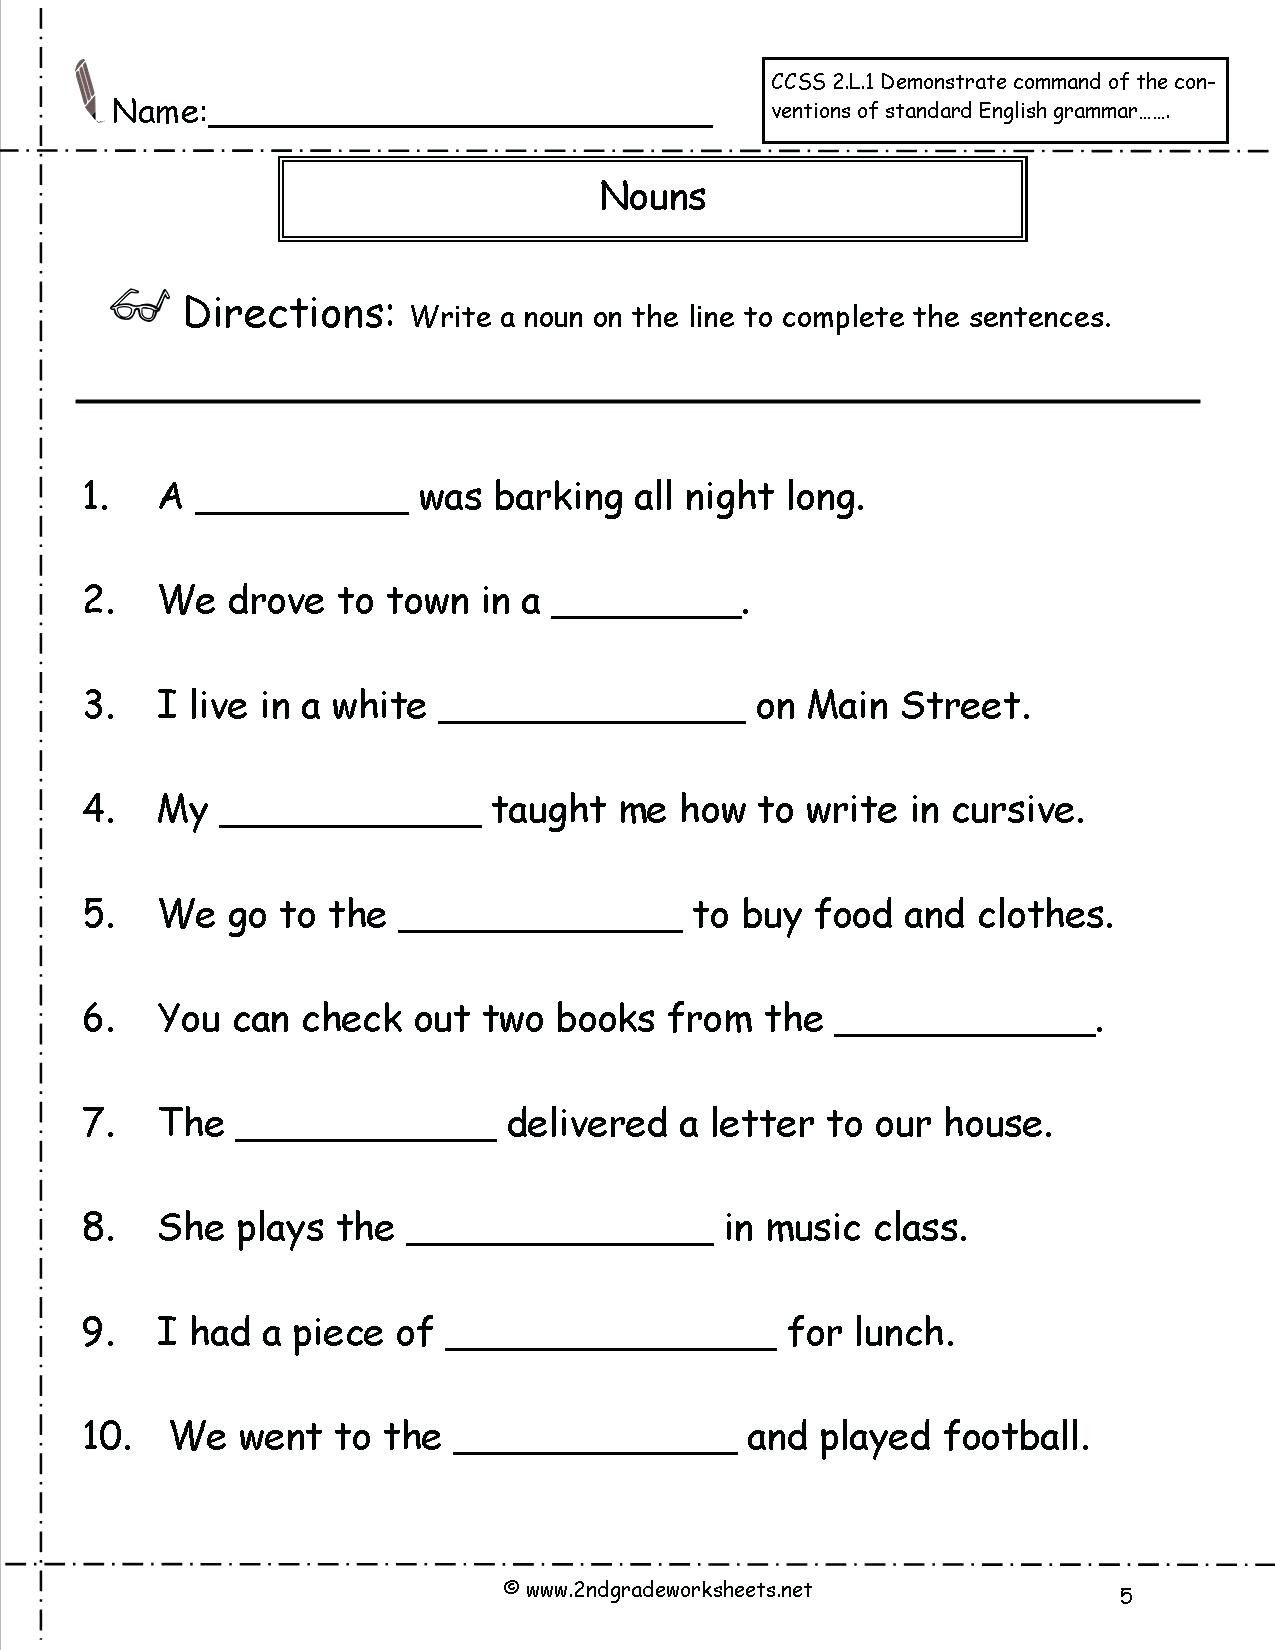 Second Grade Grammar Worksheets 2nd Grade Noun Worksheets Irregular Plural Noun Worksheet In 2020 Nouns Worksheet Possessive Nouns Worksheets 2nd Grade Worksheets